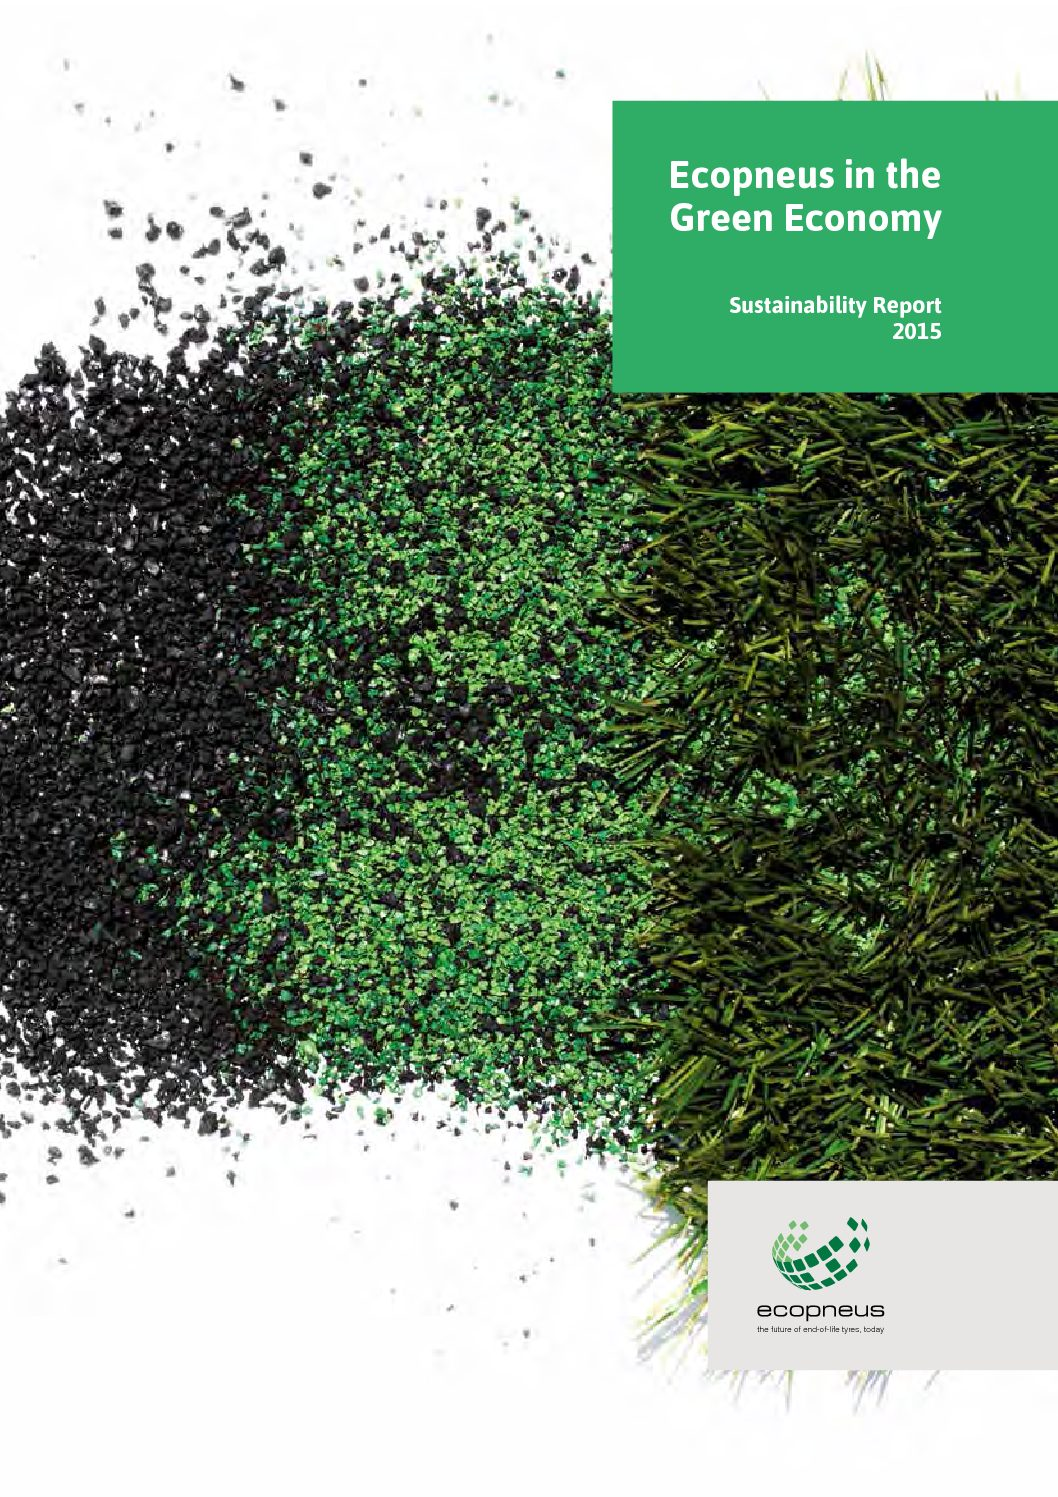 Ecopneus - Sustainability Report 2015